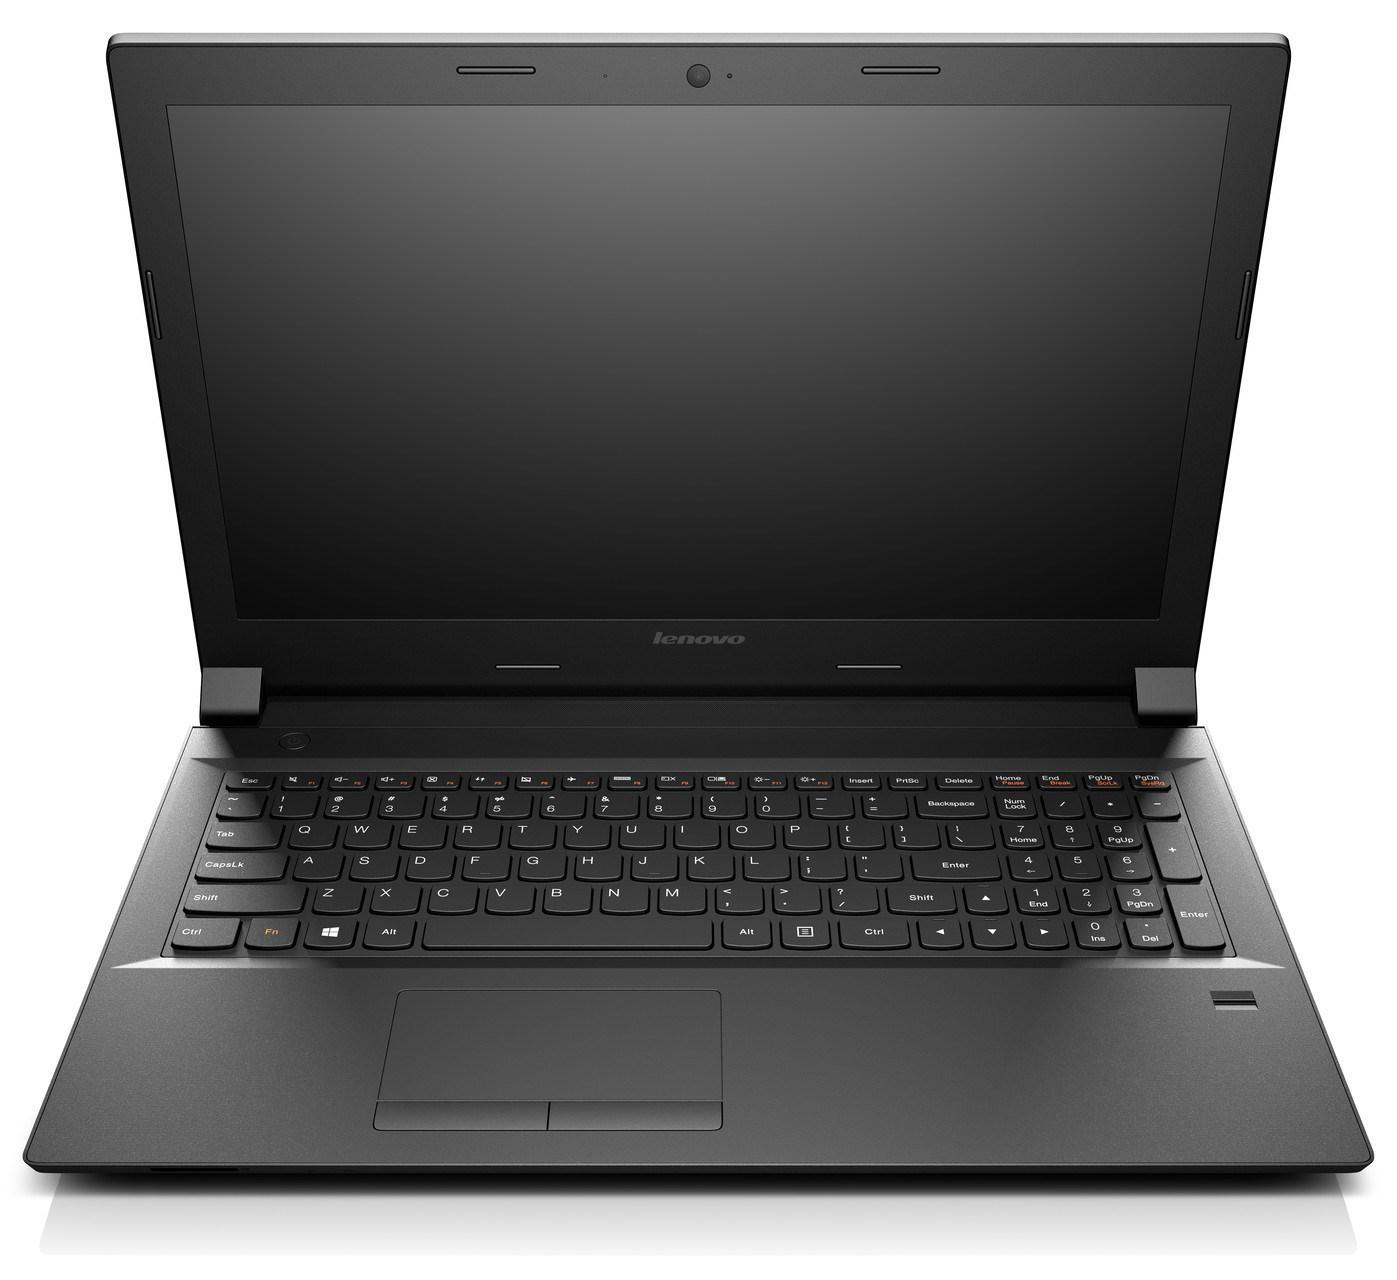 "Lenovo B50-50 15.6"" HD/3215U/1TB/4GB/HD/DVD/F/Win 10 Home"